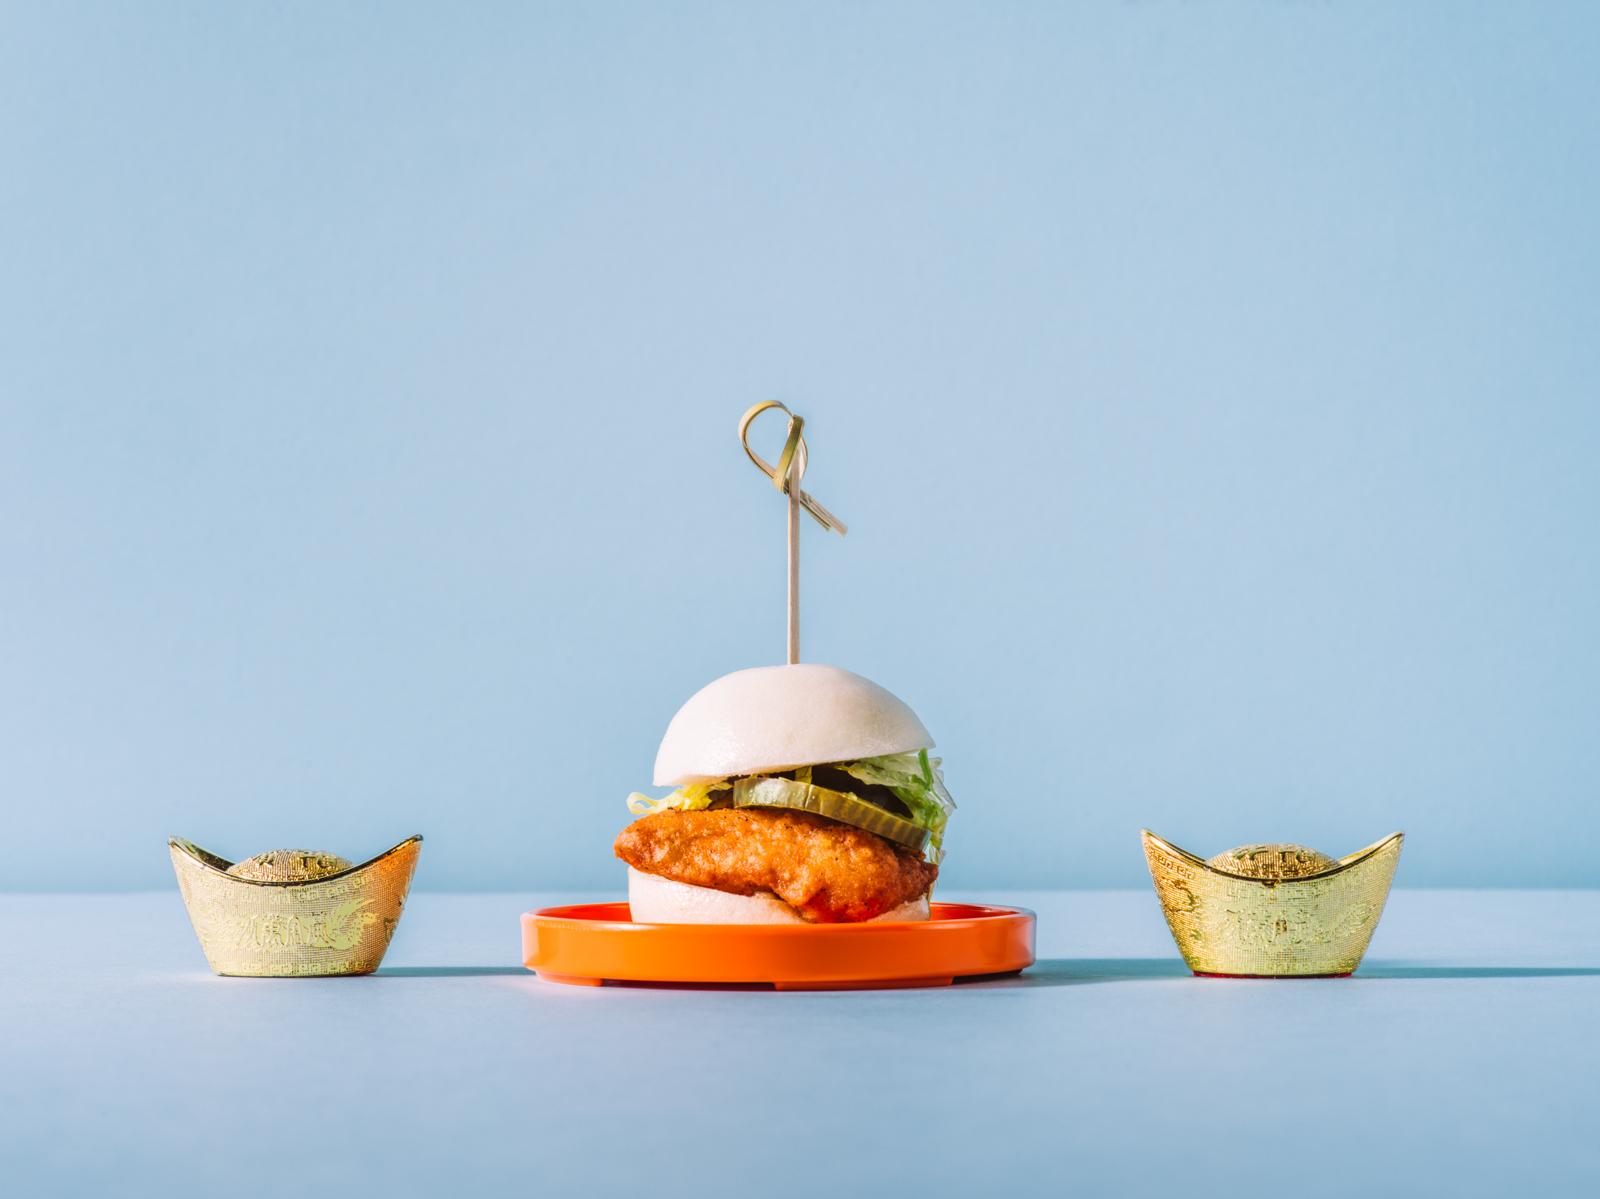 Rice-and-Gold-Food-All-Good-NYC-Nick-Johnson-Photography-9.JPG